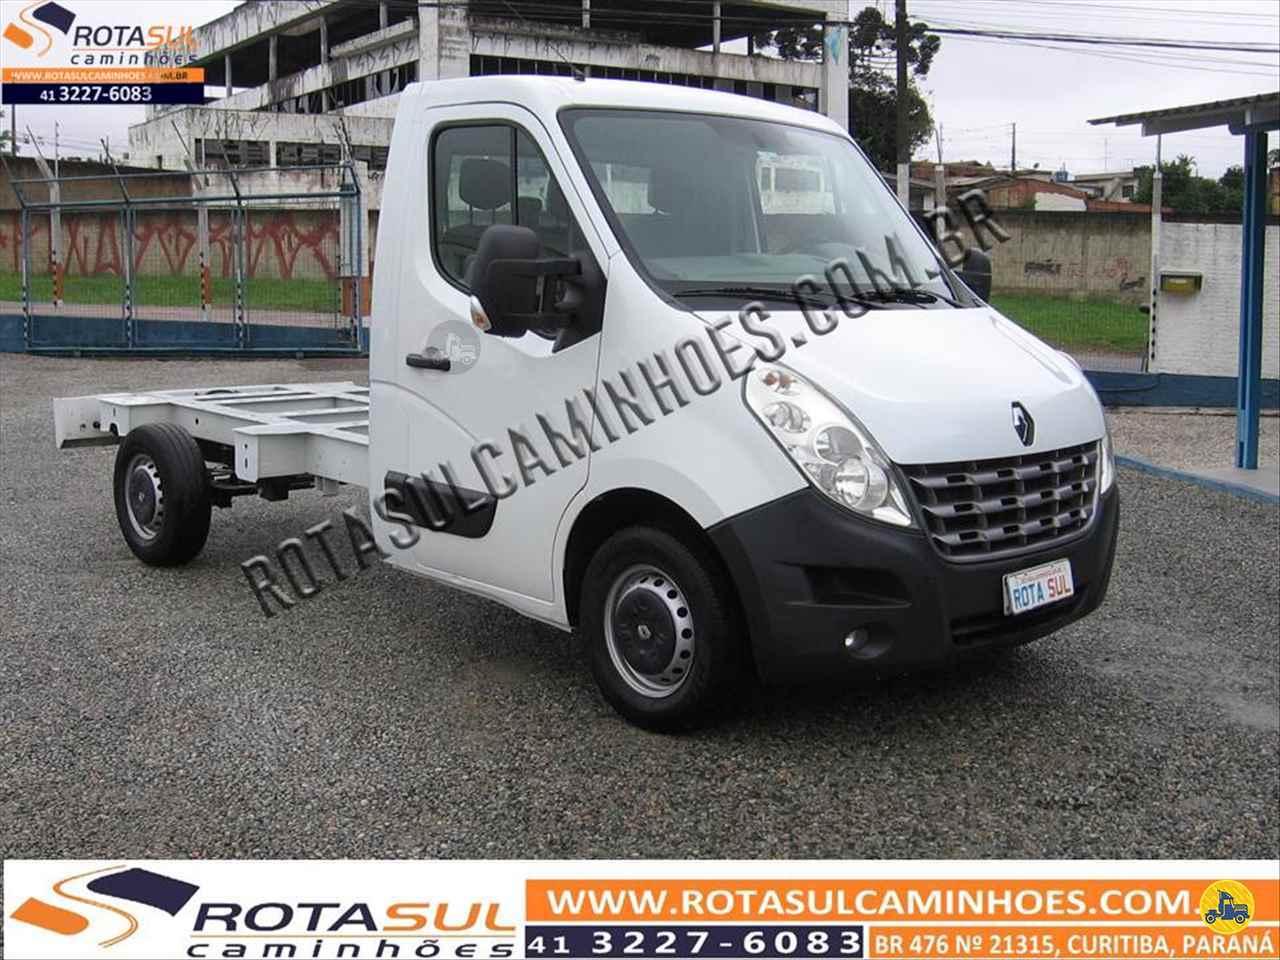 UTILITARIOS RENAULT Master Chassi Cabine 2.3 Rota Sul Caminhões CURITIBA PARANÁ PR